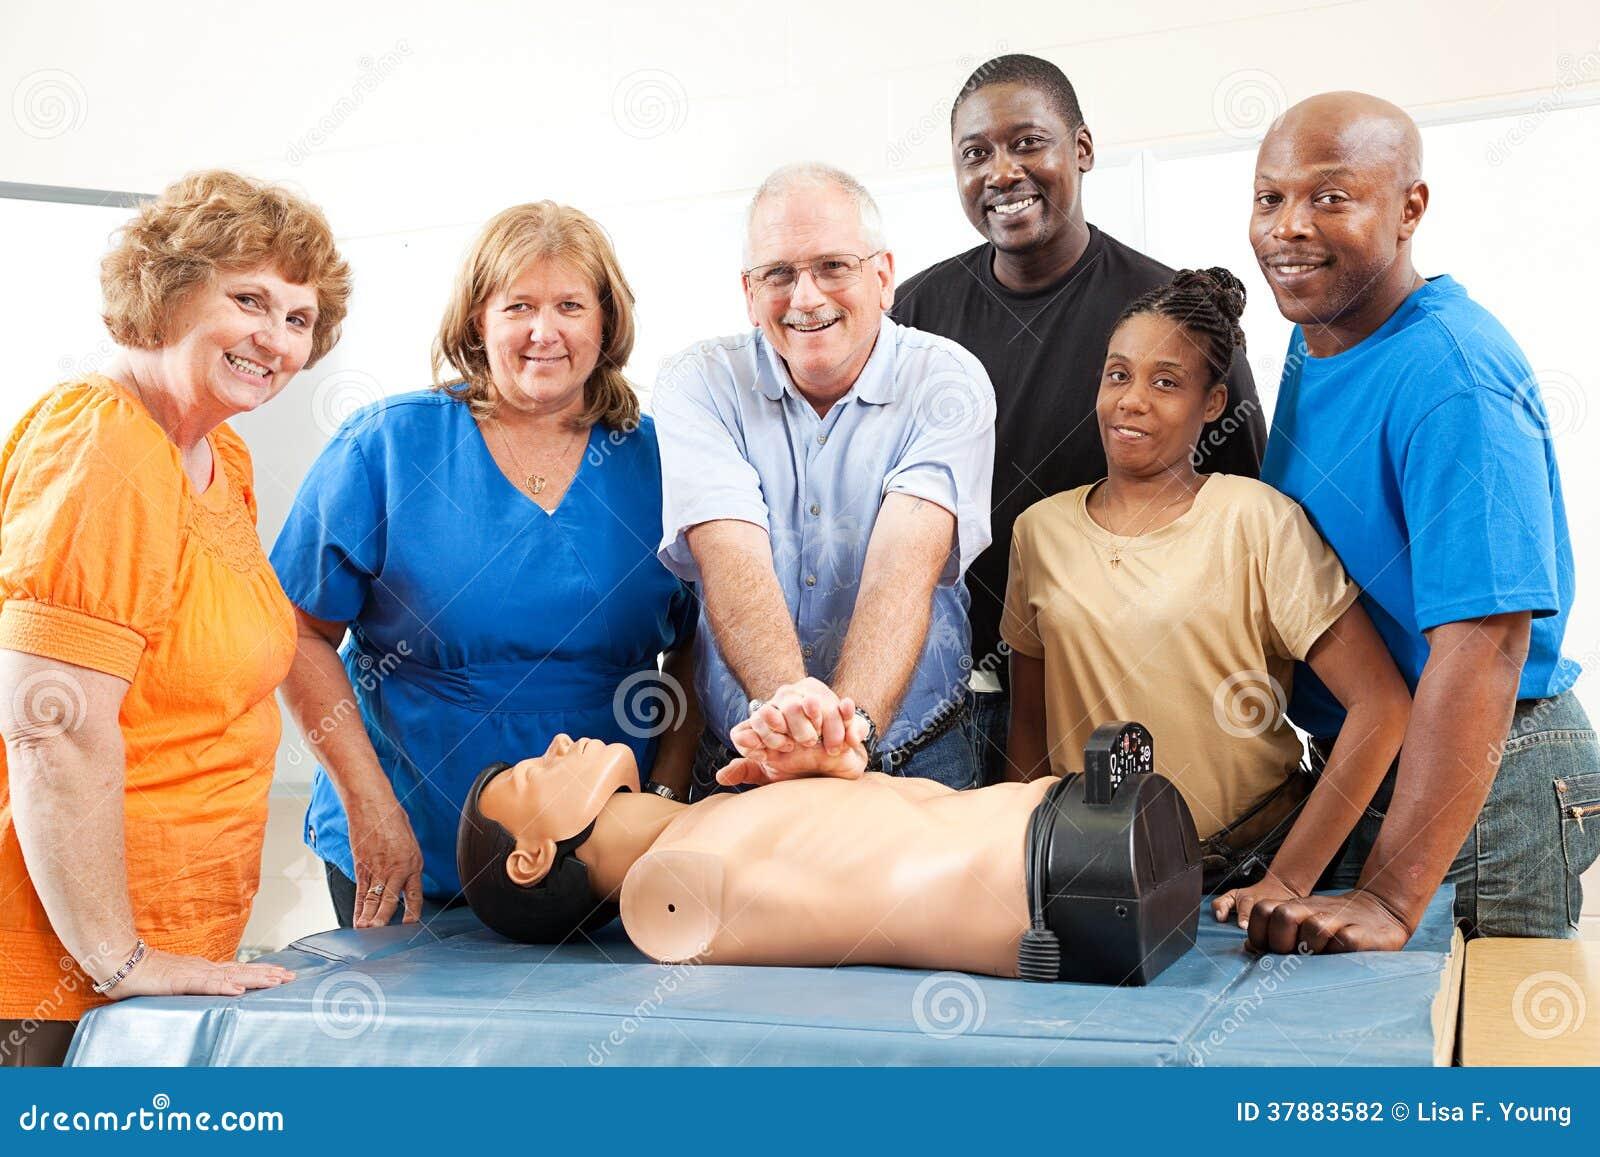 adult education instructor class organization jpg 853x1280